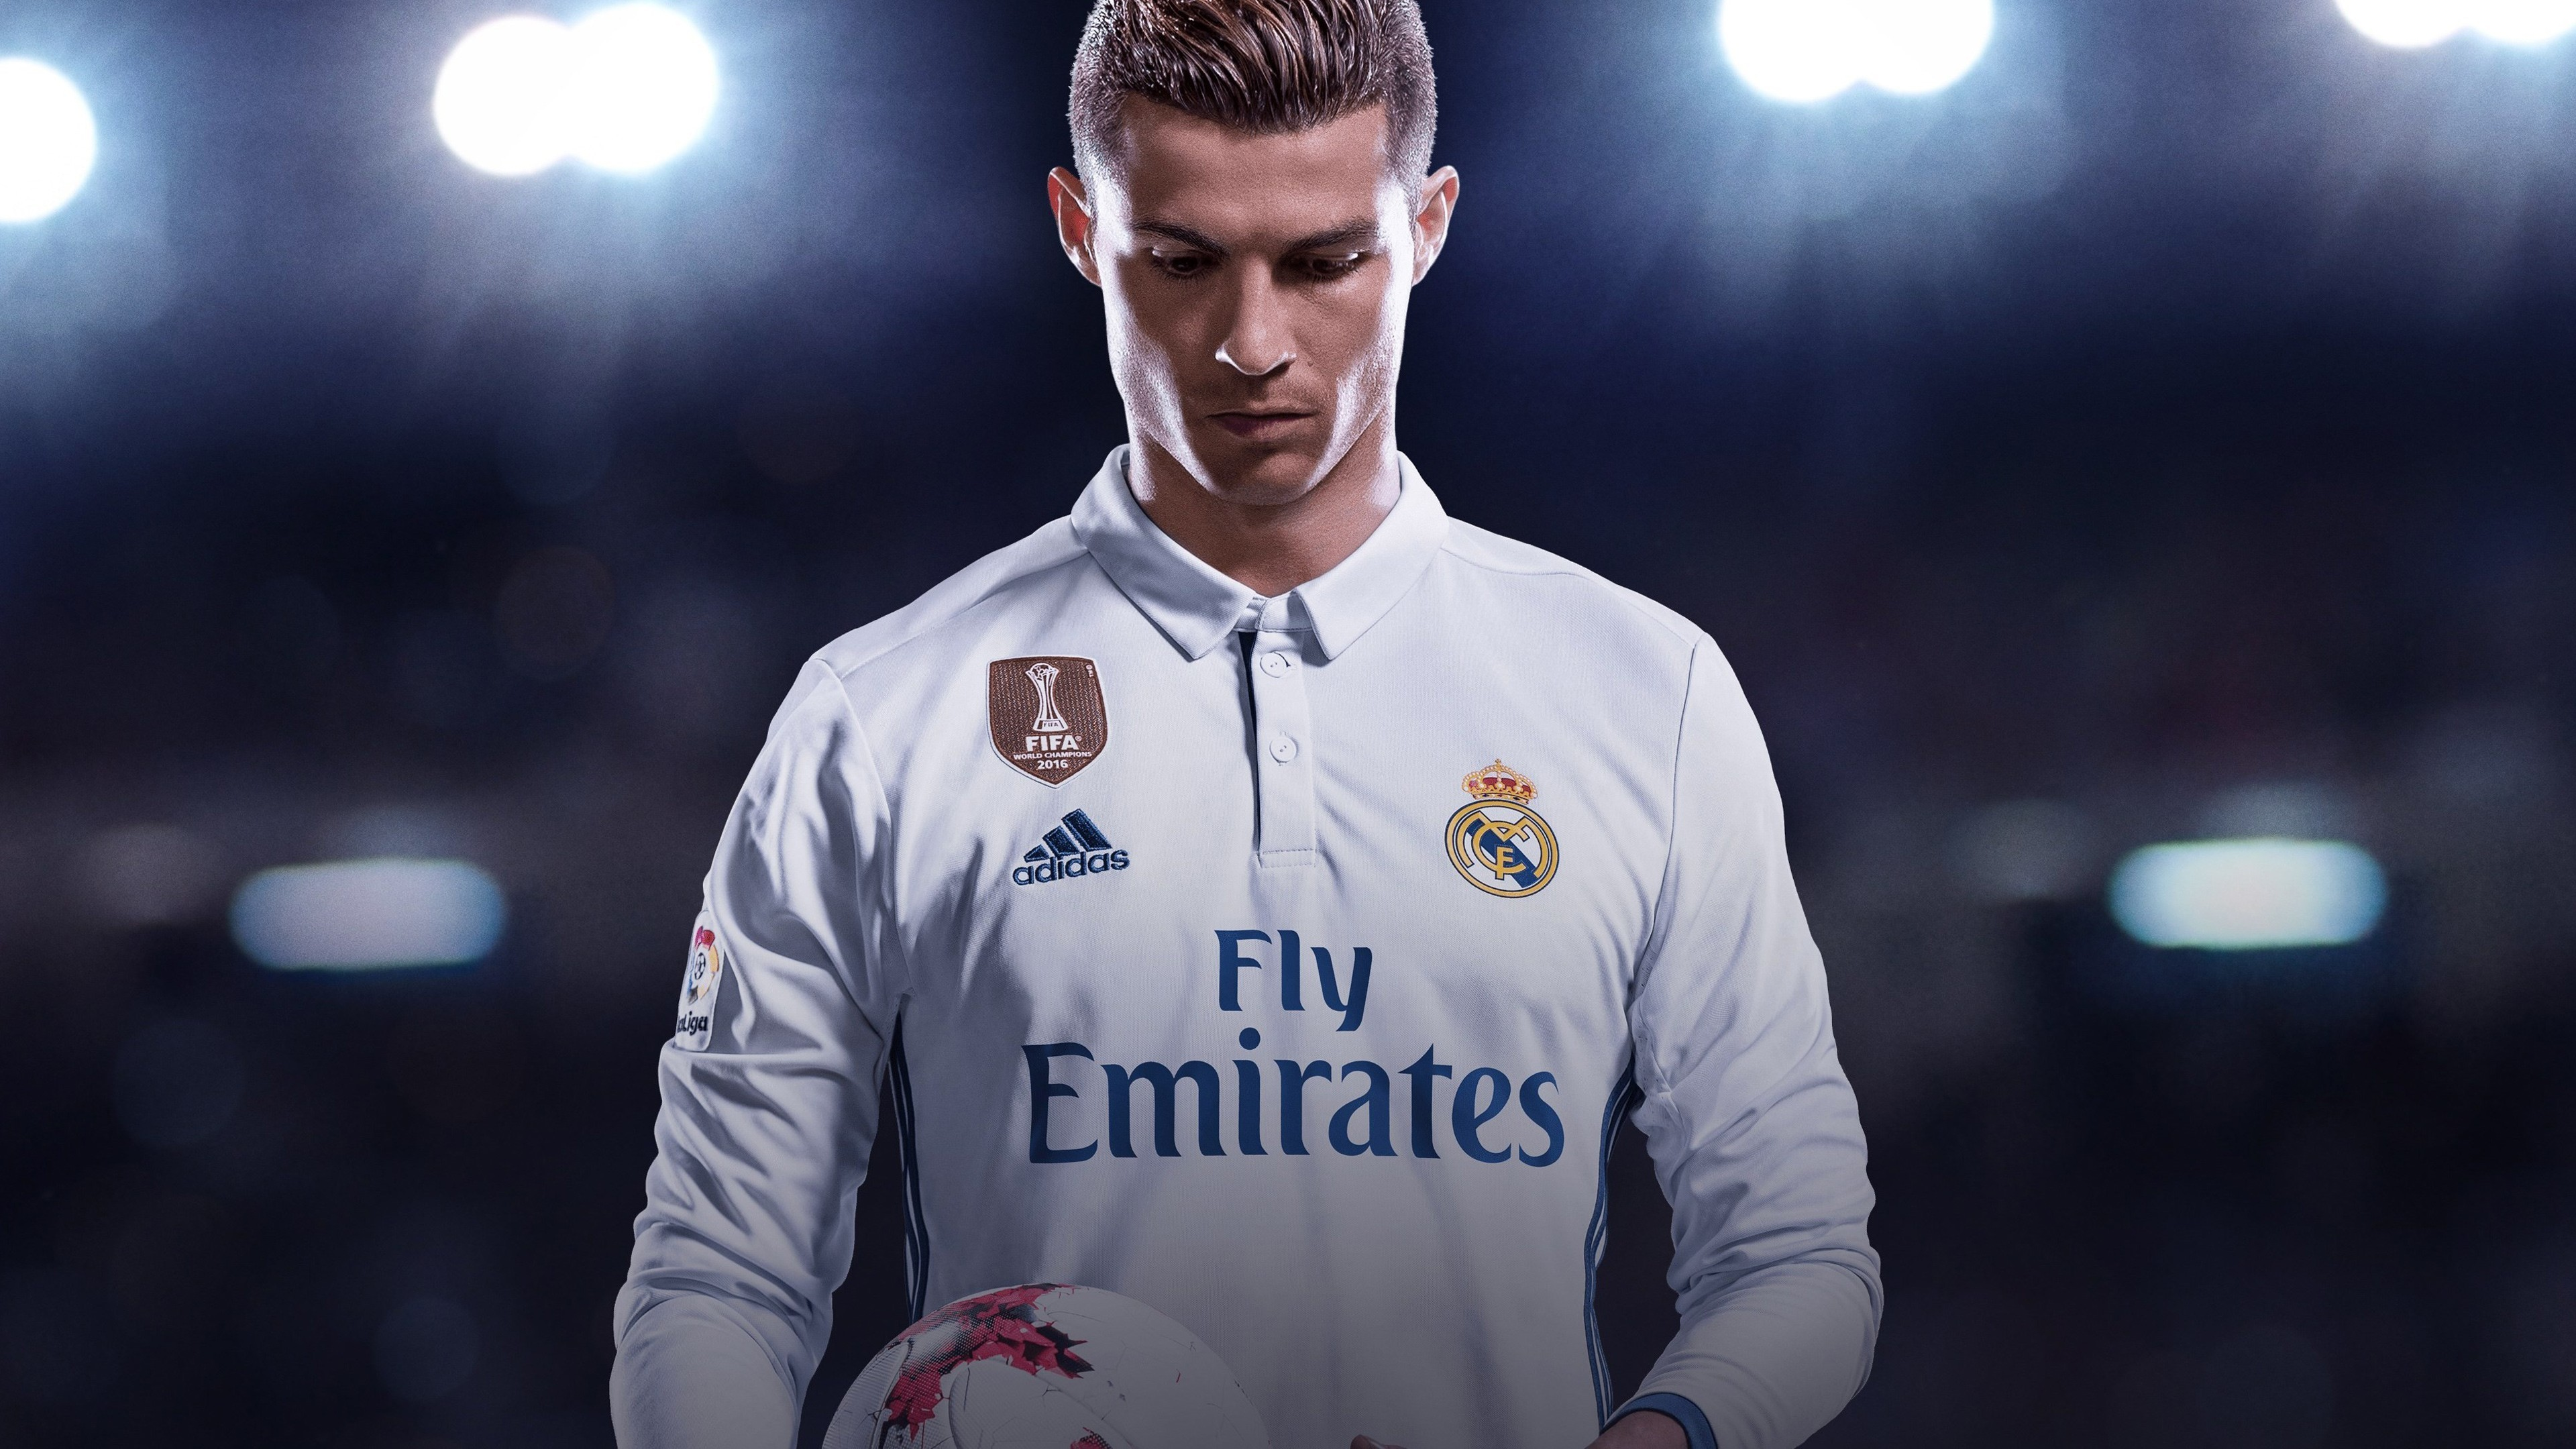 Ultra HD 4K resolutions:3840 x 2160 Original. Description: Download Cristiano  Ronaldo FIFA 18 Games wallpaper …